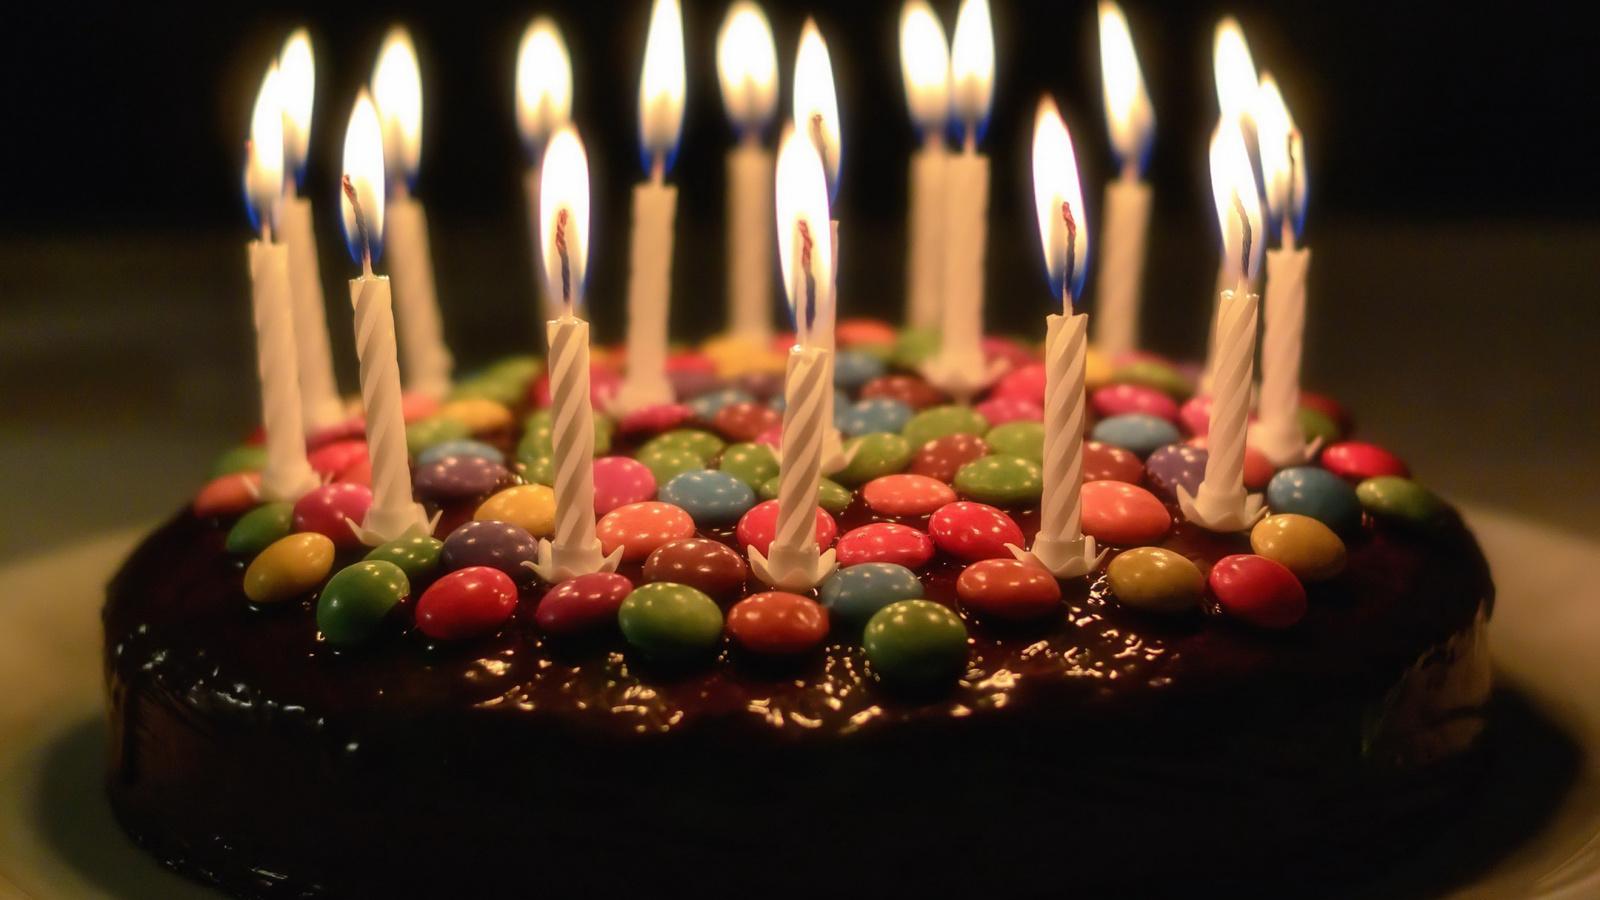 торт, свечи, праздник